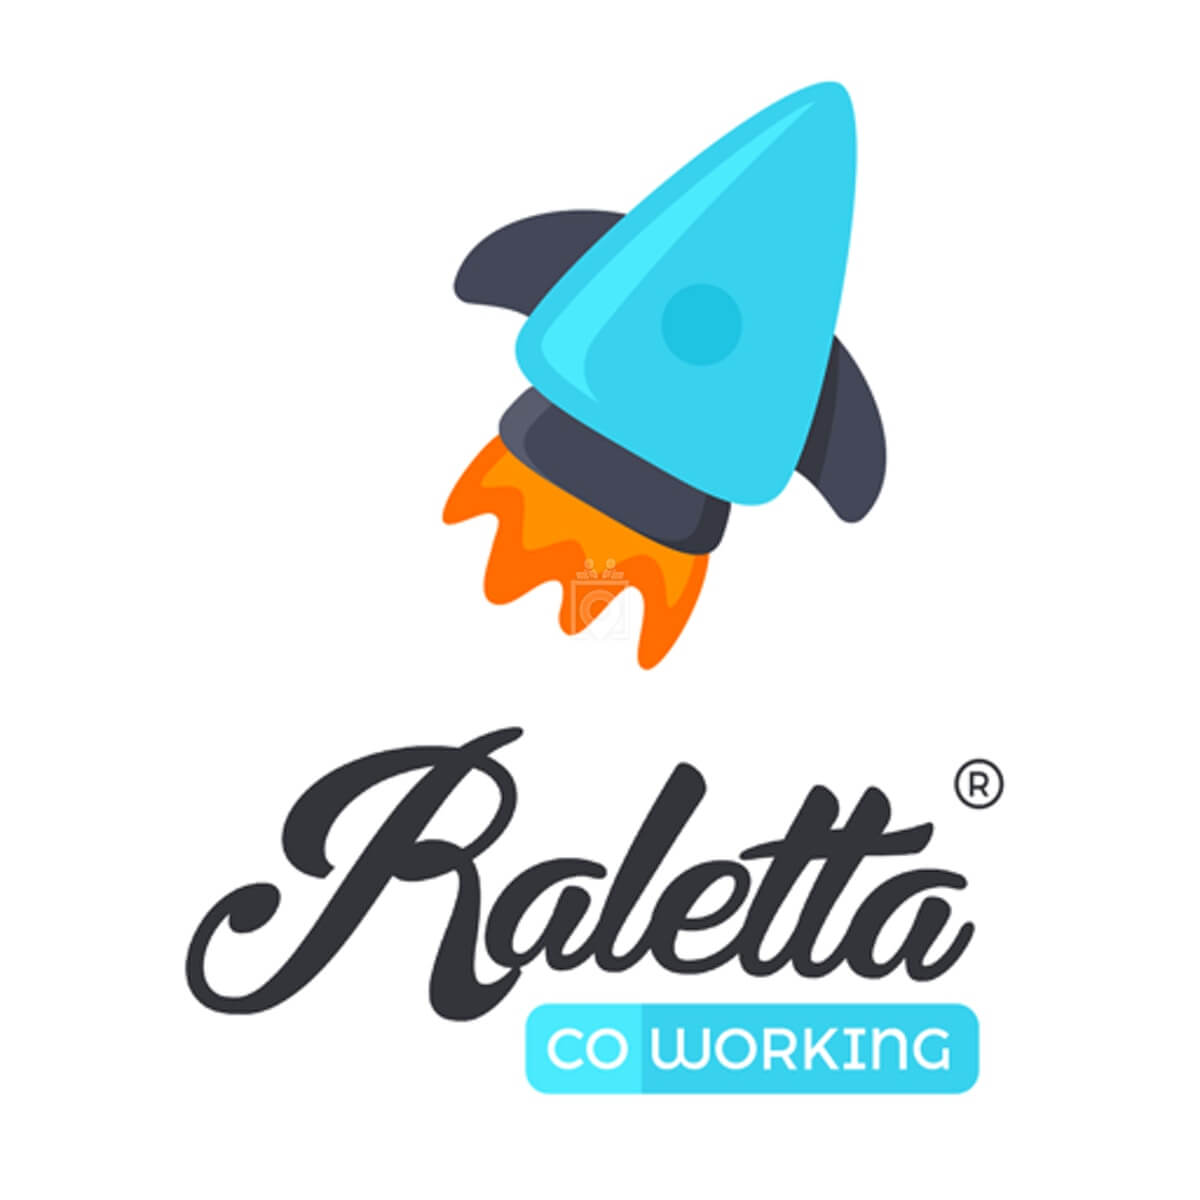 Raletta Coworking| Bookofficenow